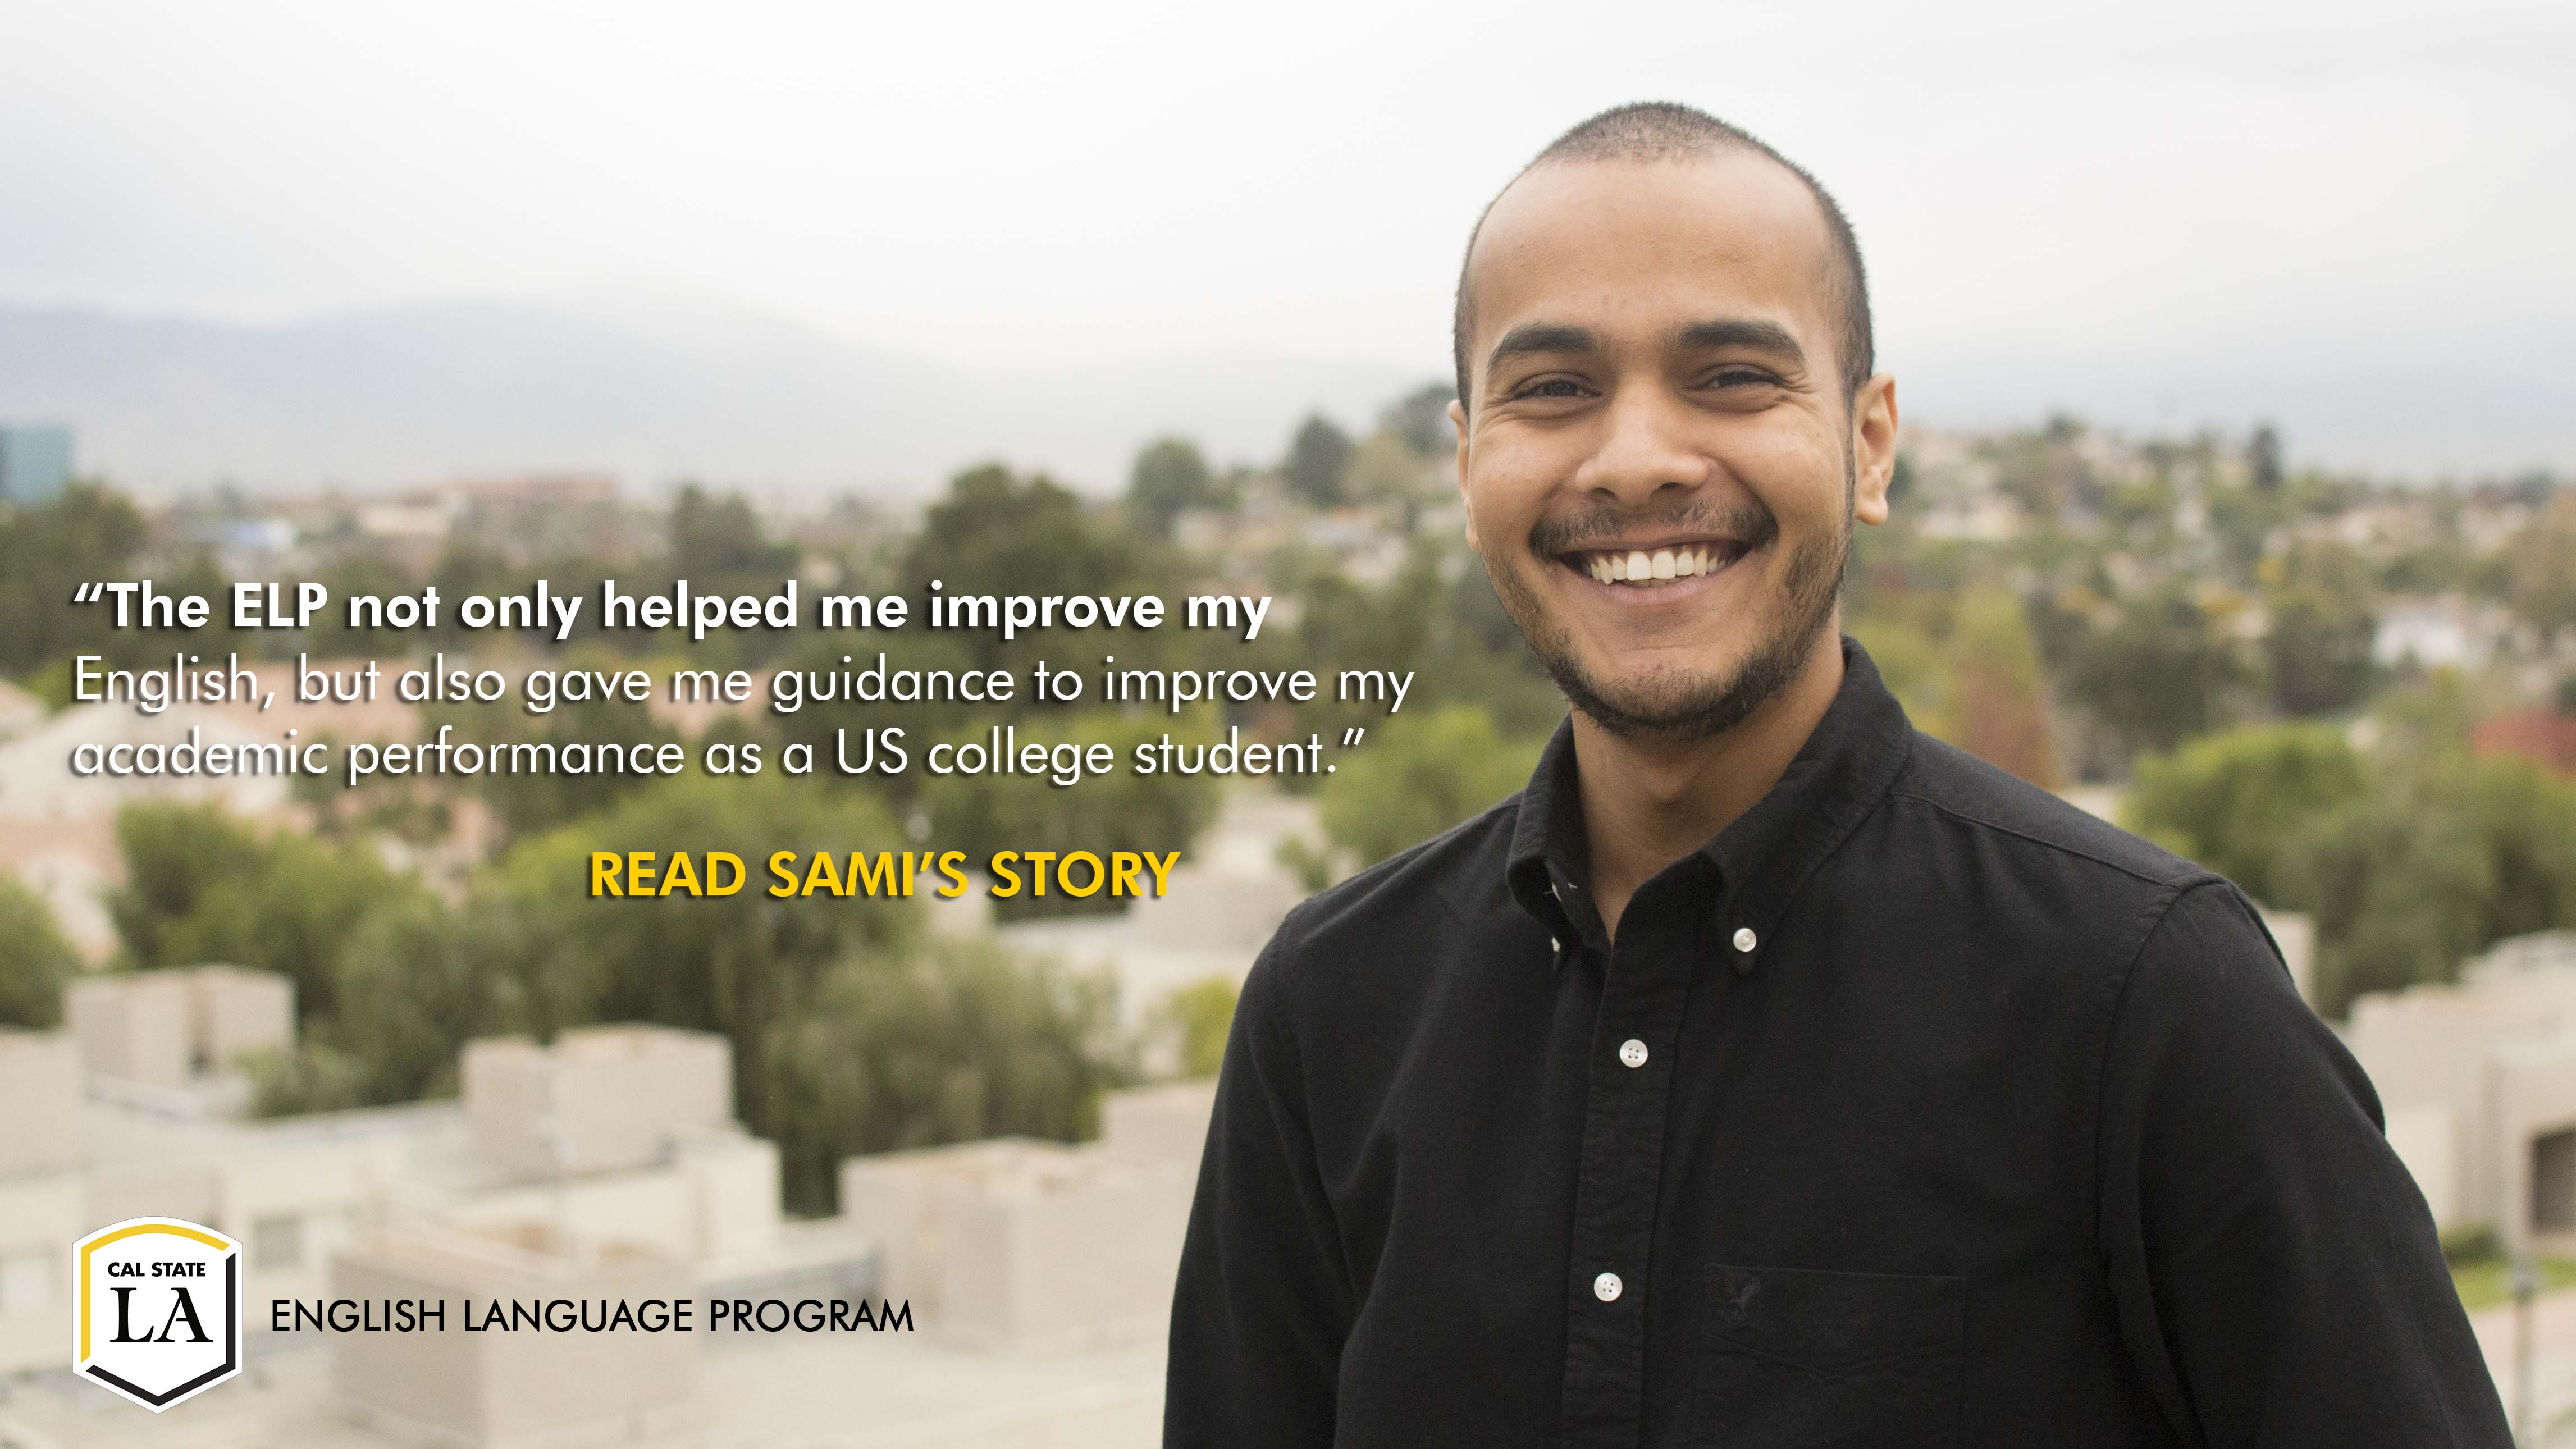 Sami's Story